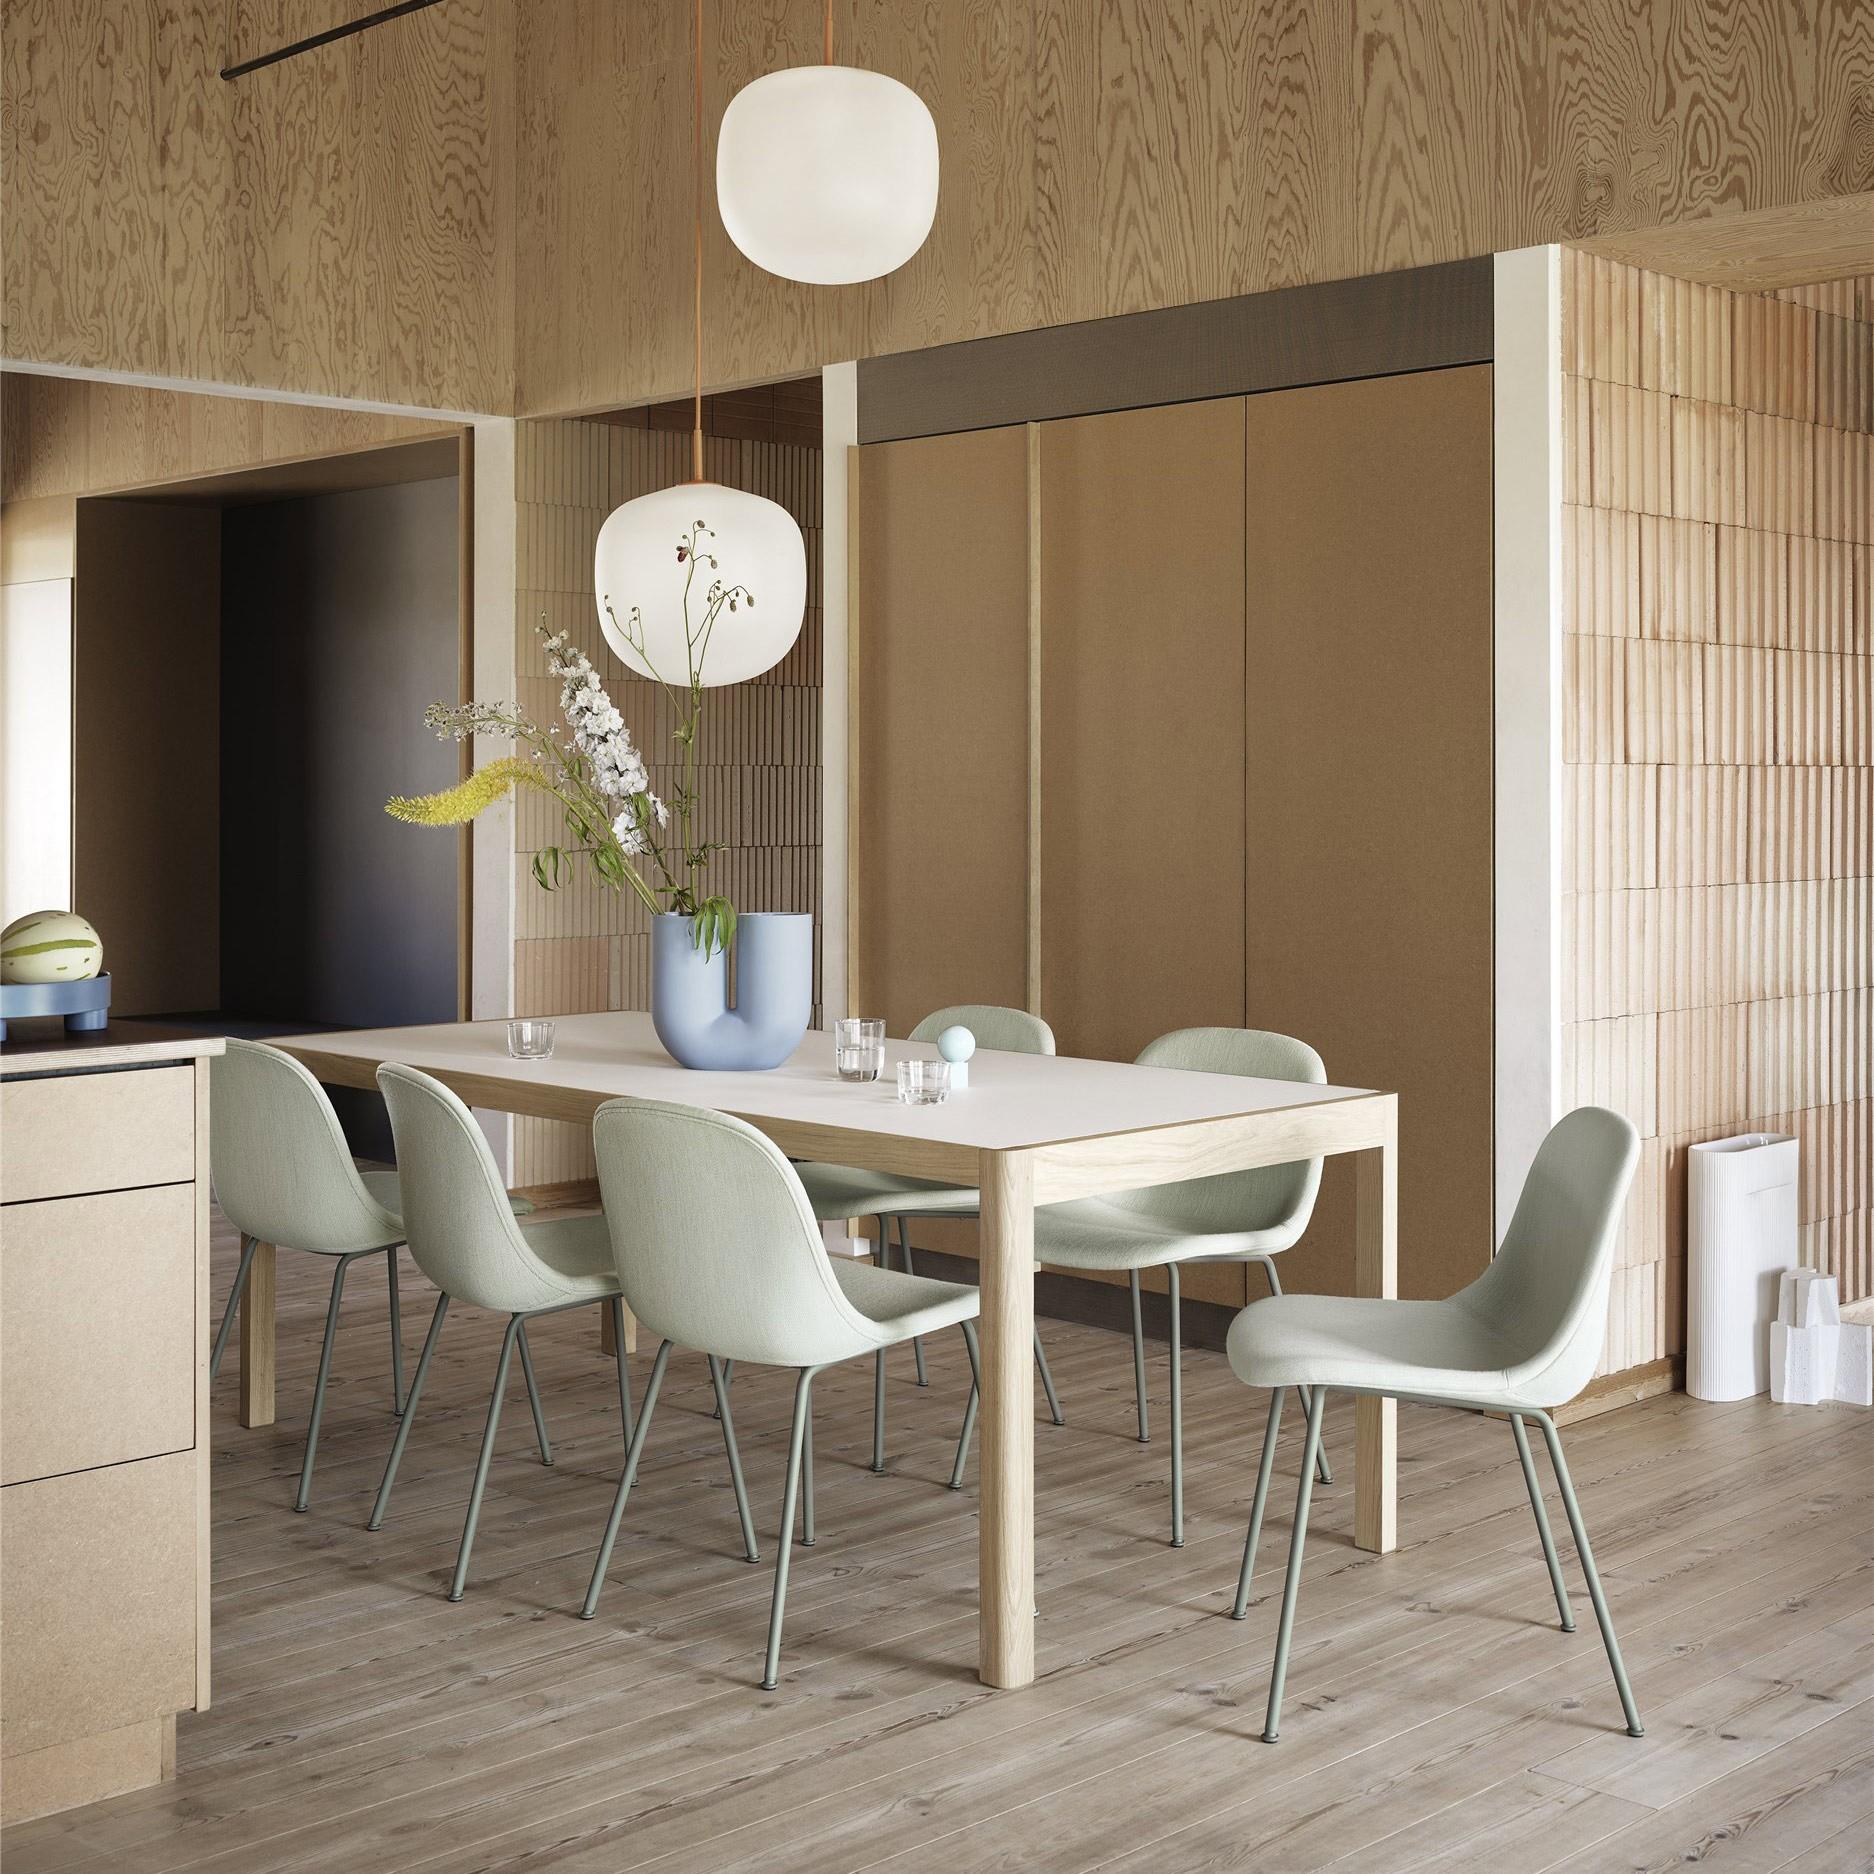 Muuto Workshop Dining Table L 200cm Ambientedirect